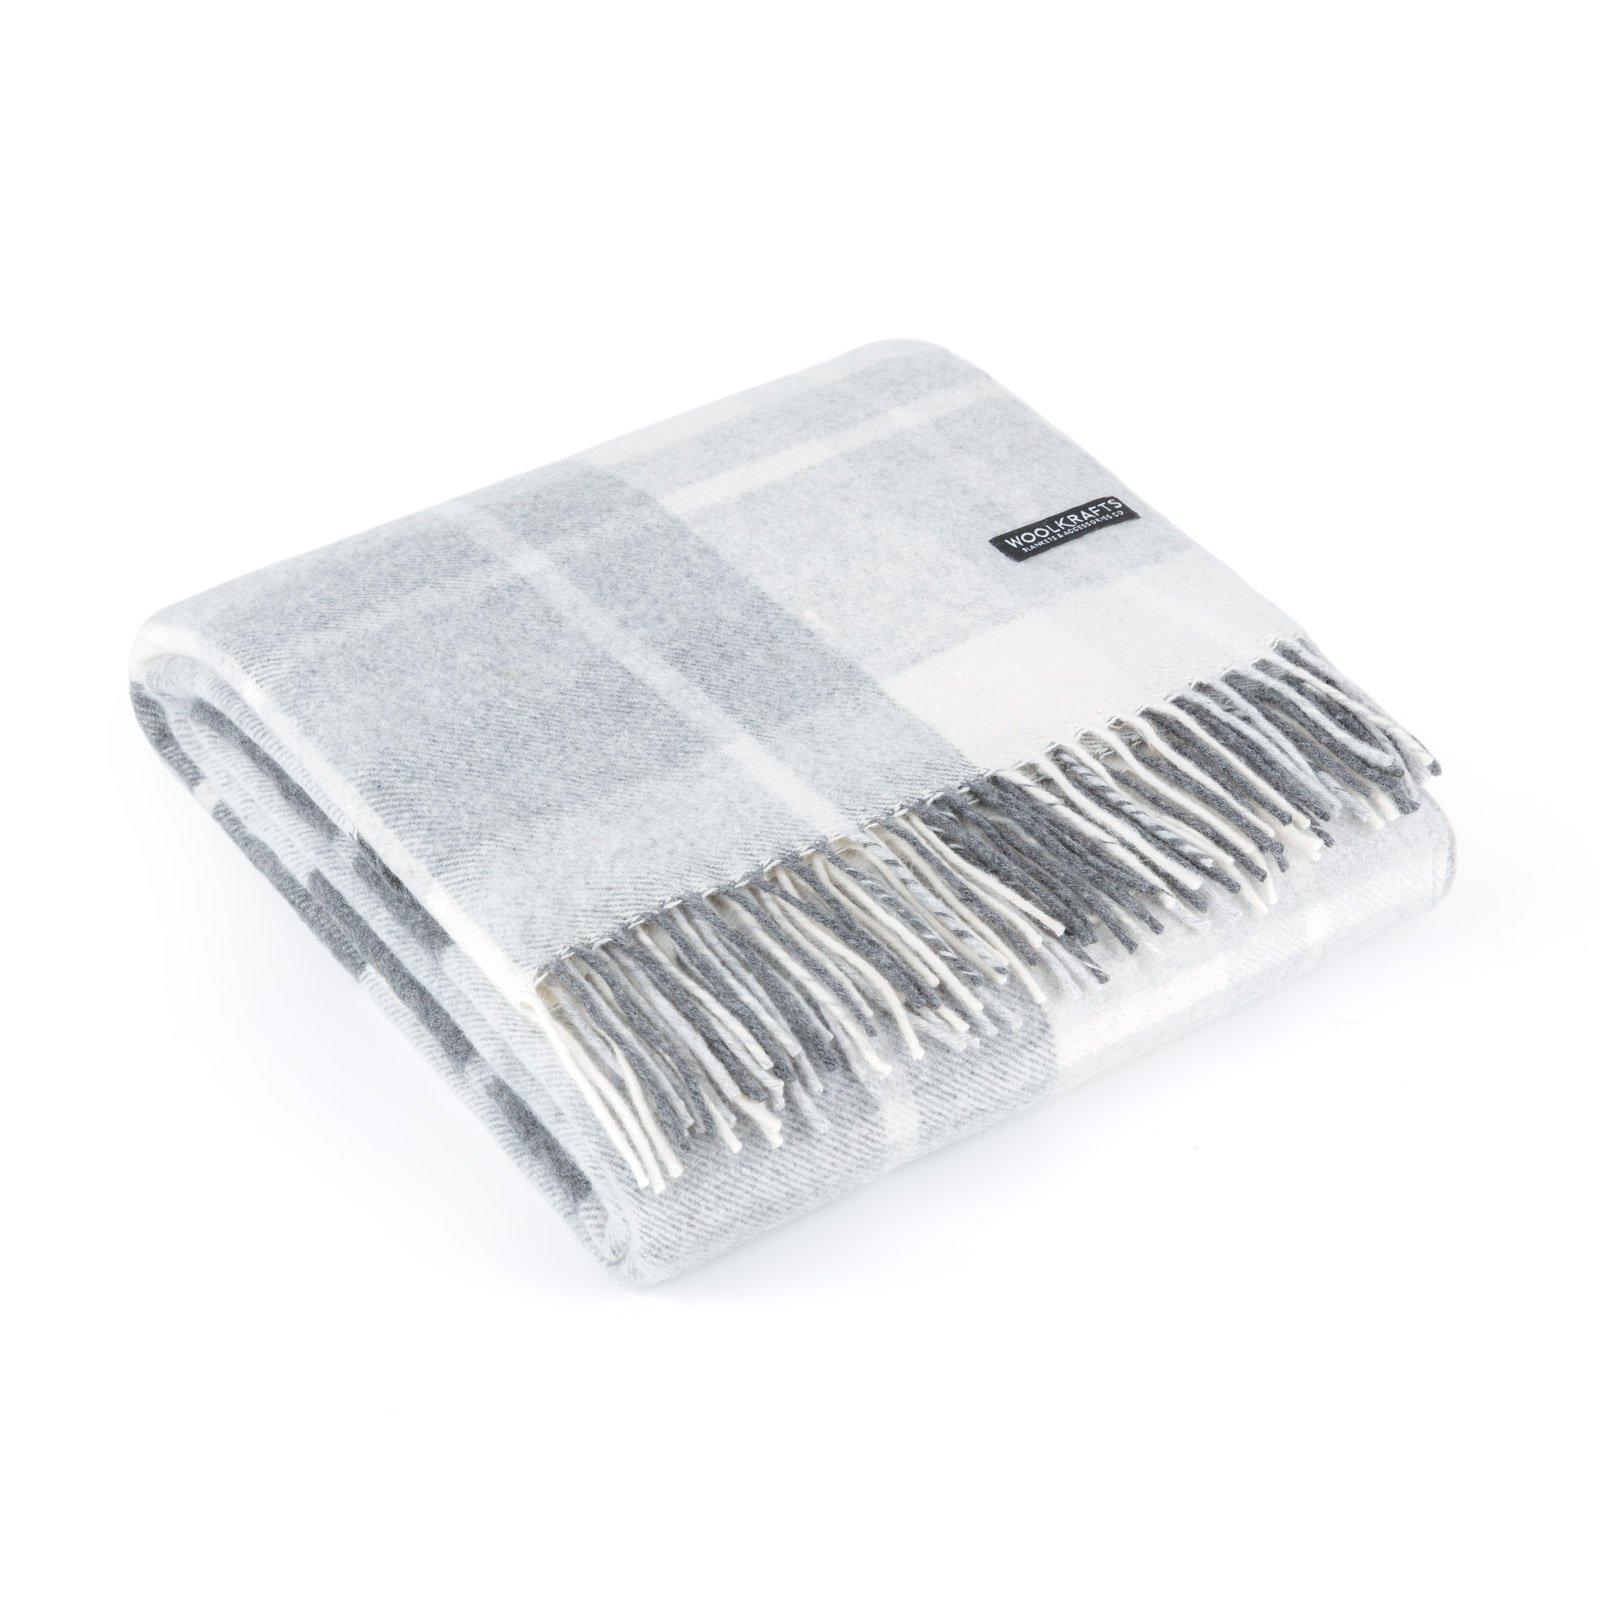 Bestwool Cashmere Wool Throw Blanket Plaid - Grey White 55'' x 70'' by Bestwool